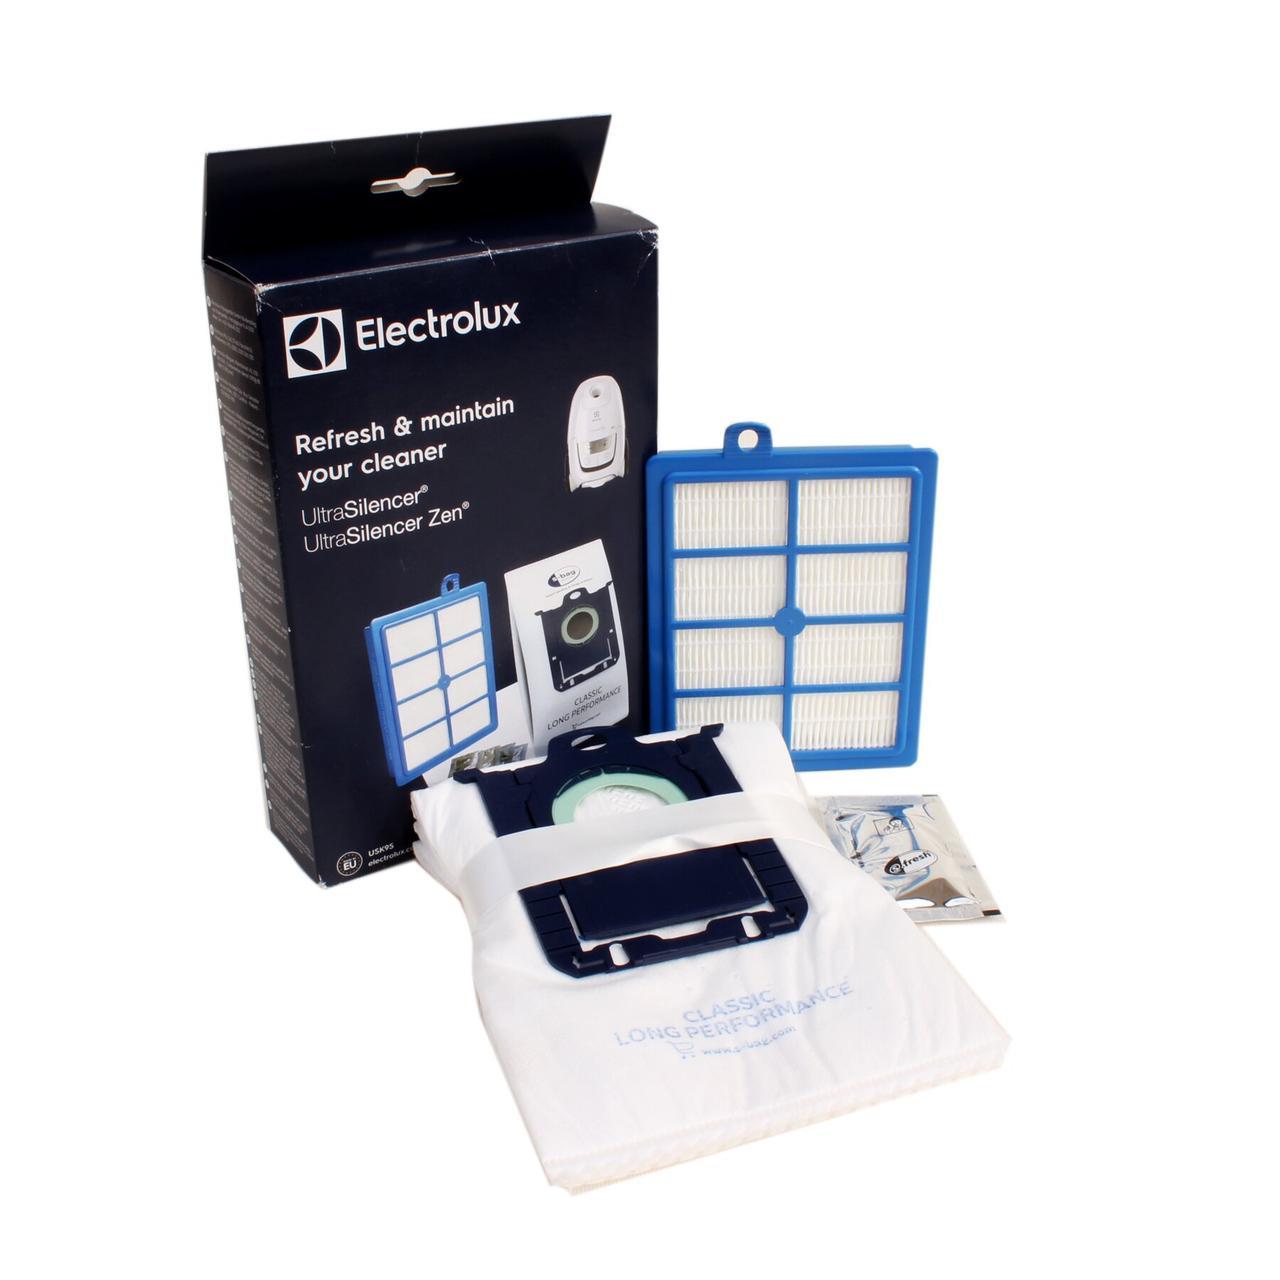 Стартовый набор Electrolux USK9S для пылесоса Electrolux UltraSilencer 9009229700